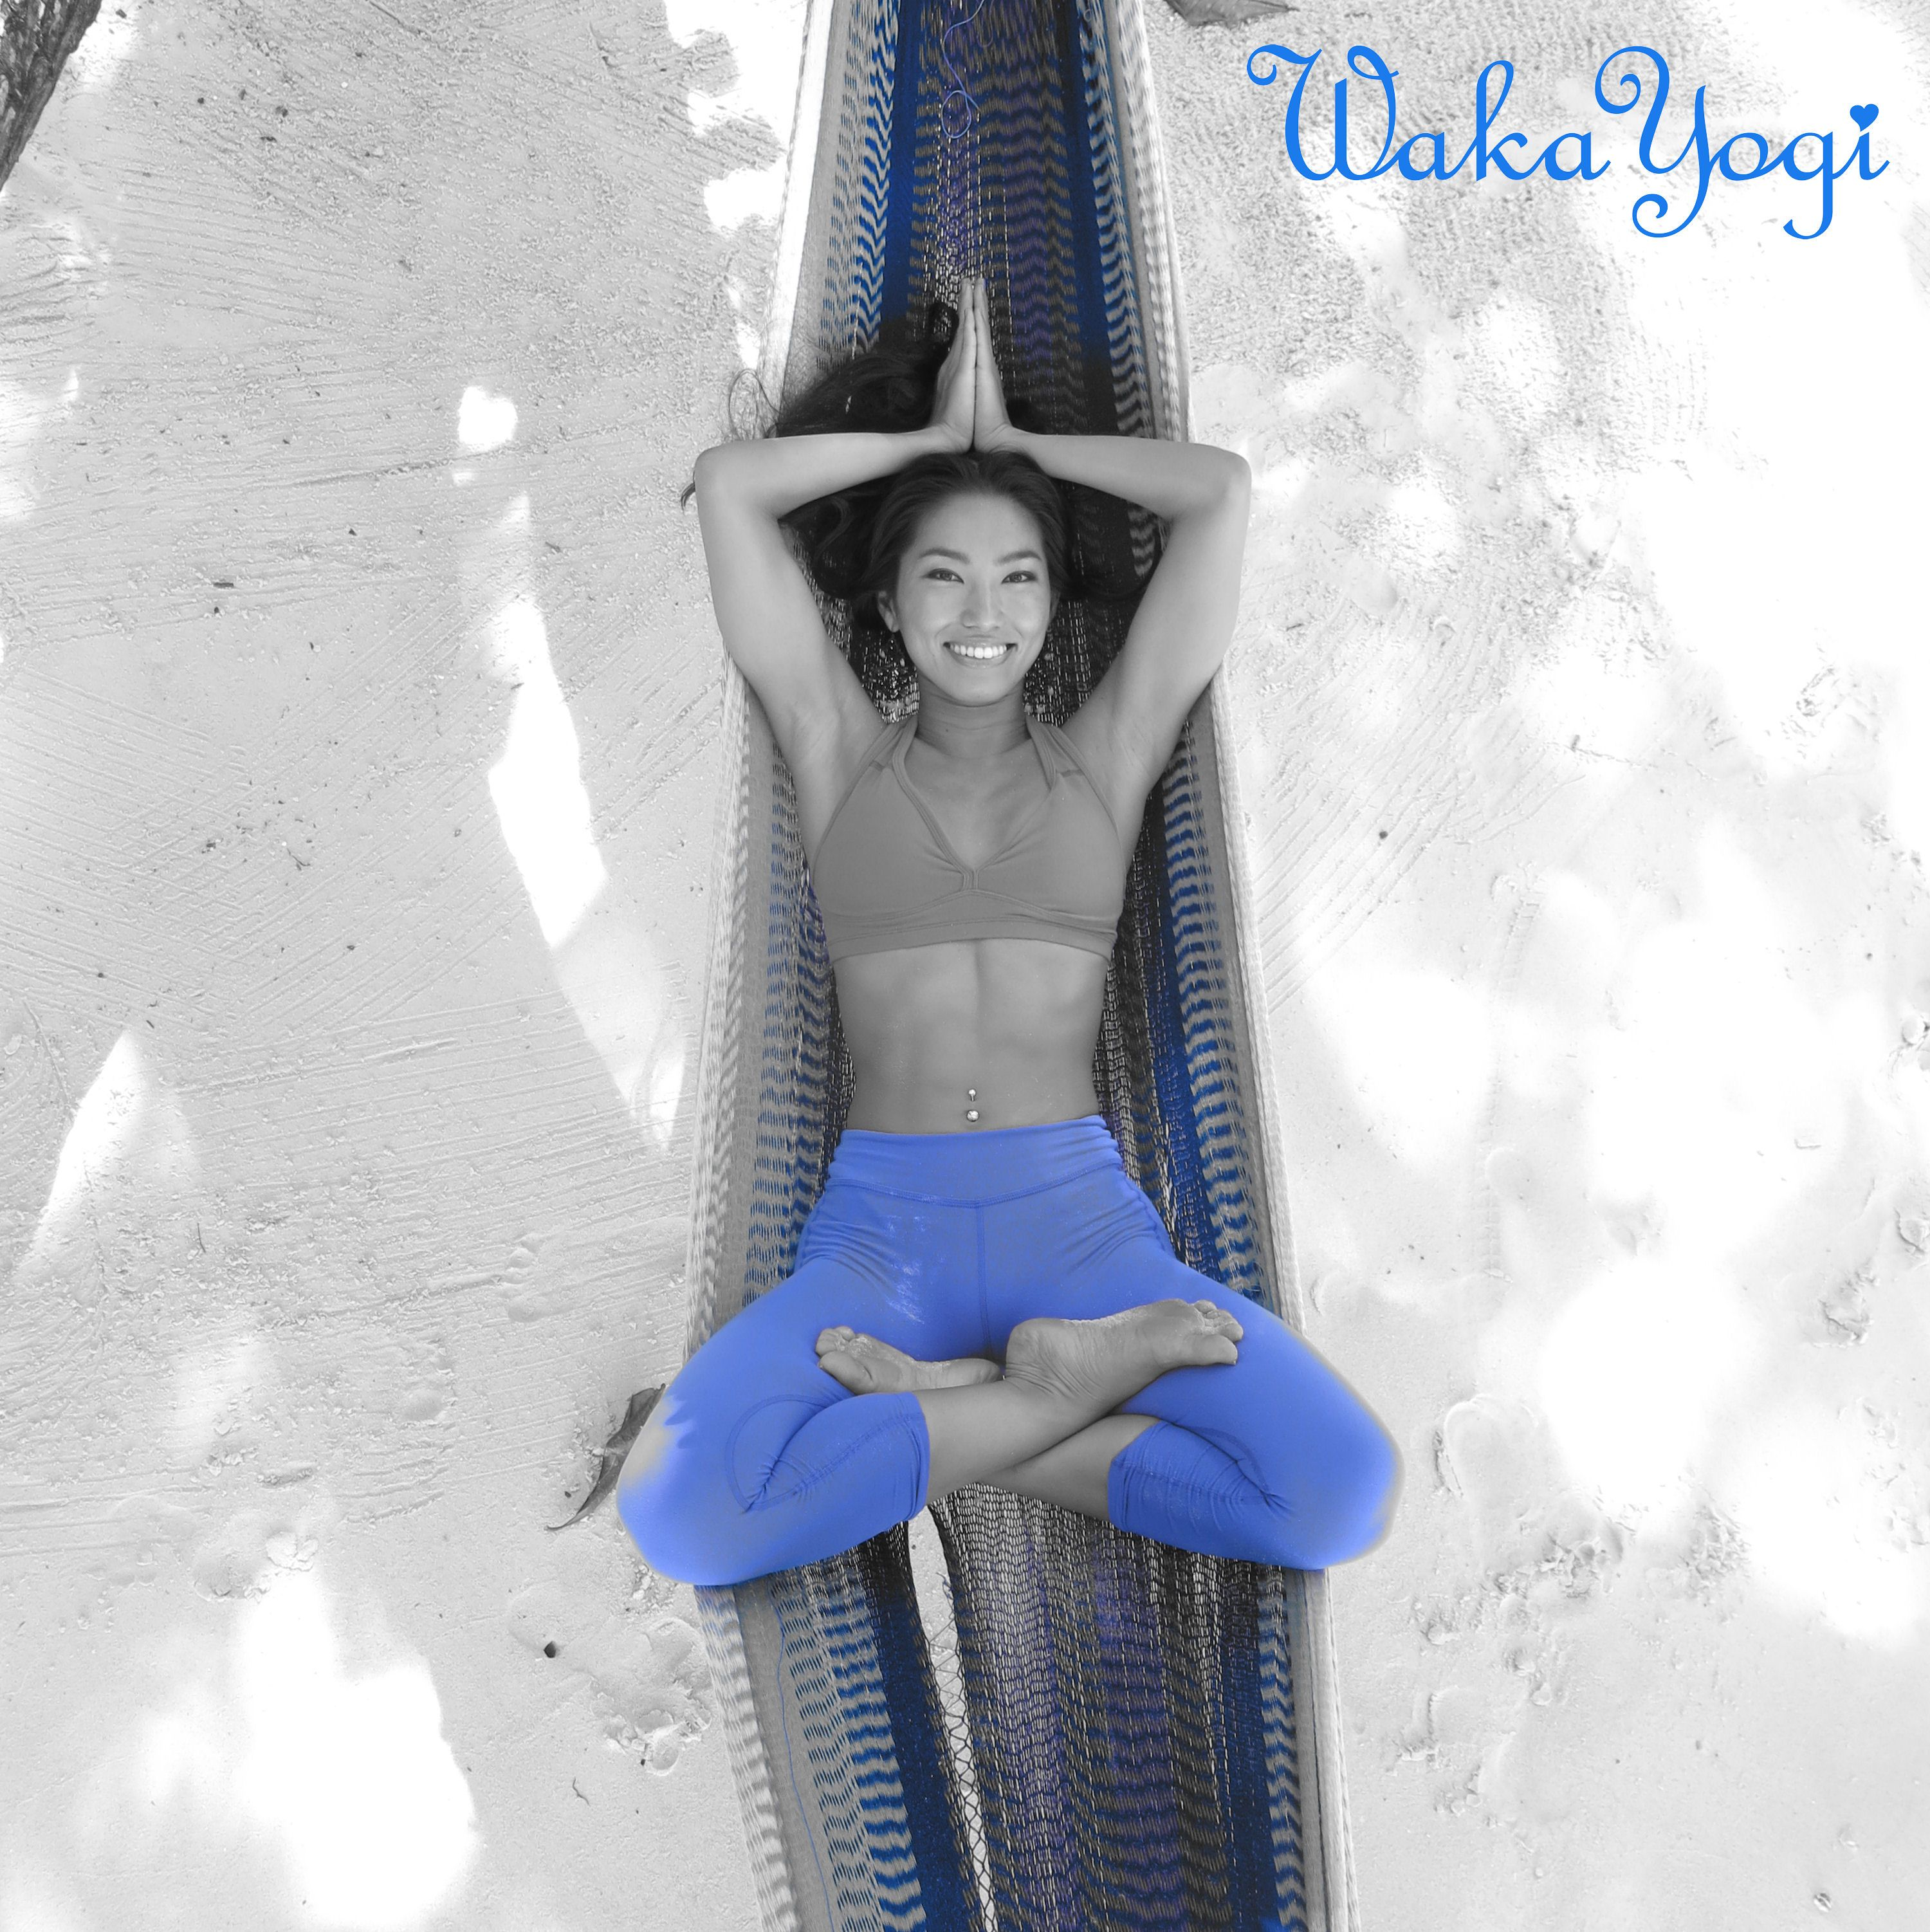 Reclining Lotus pose....in a hammock!  sc 1 st  Pinterest & Reclining Lotus pose....in a hammock!! | Waka Yogi | Pinterest ... islam-shia.org